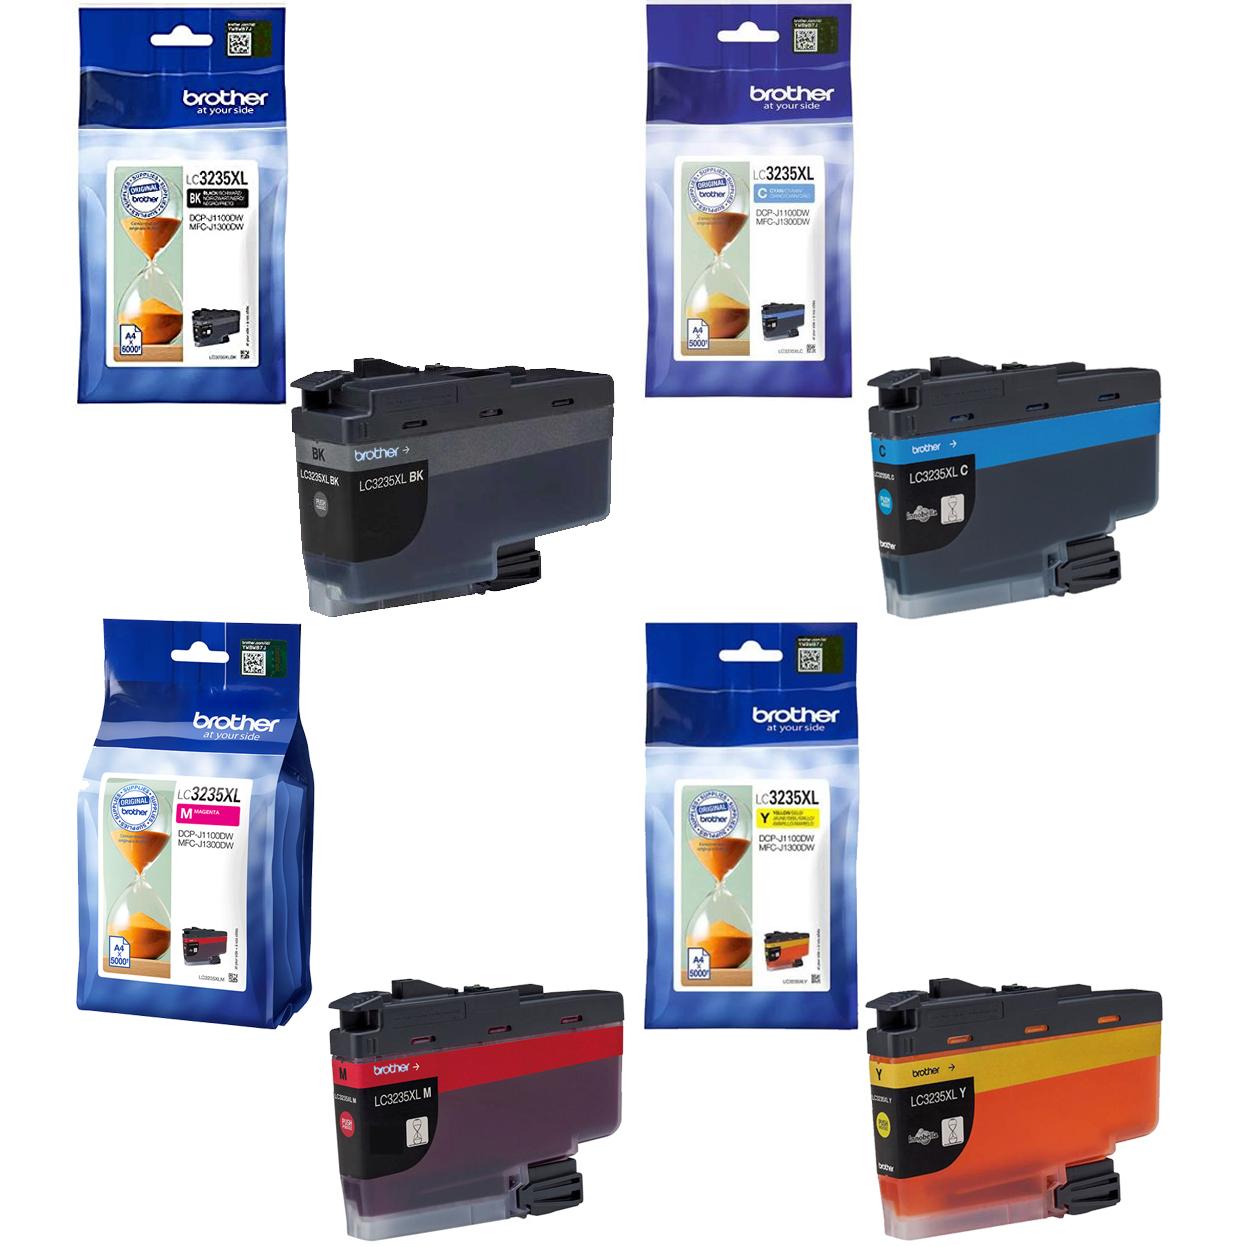 Original Brother LC3235XL CMYK Multipack High Capacity Ink Cartridges (LC3235XLBK/ LC3235XLC/ LC3235XLM/ LC3235XLY)